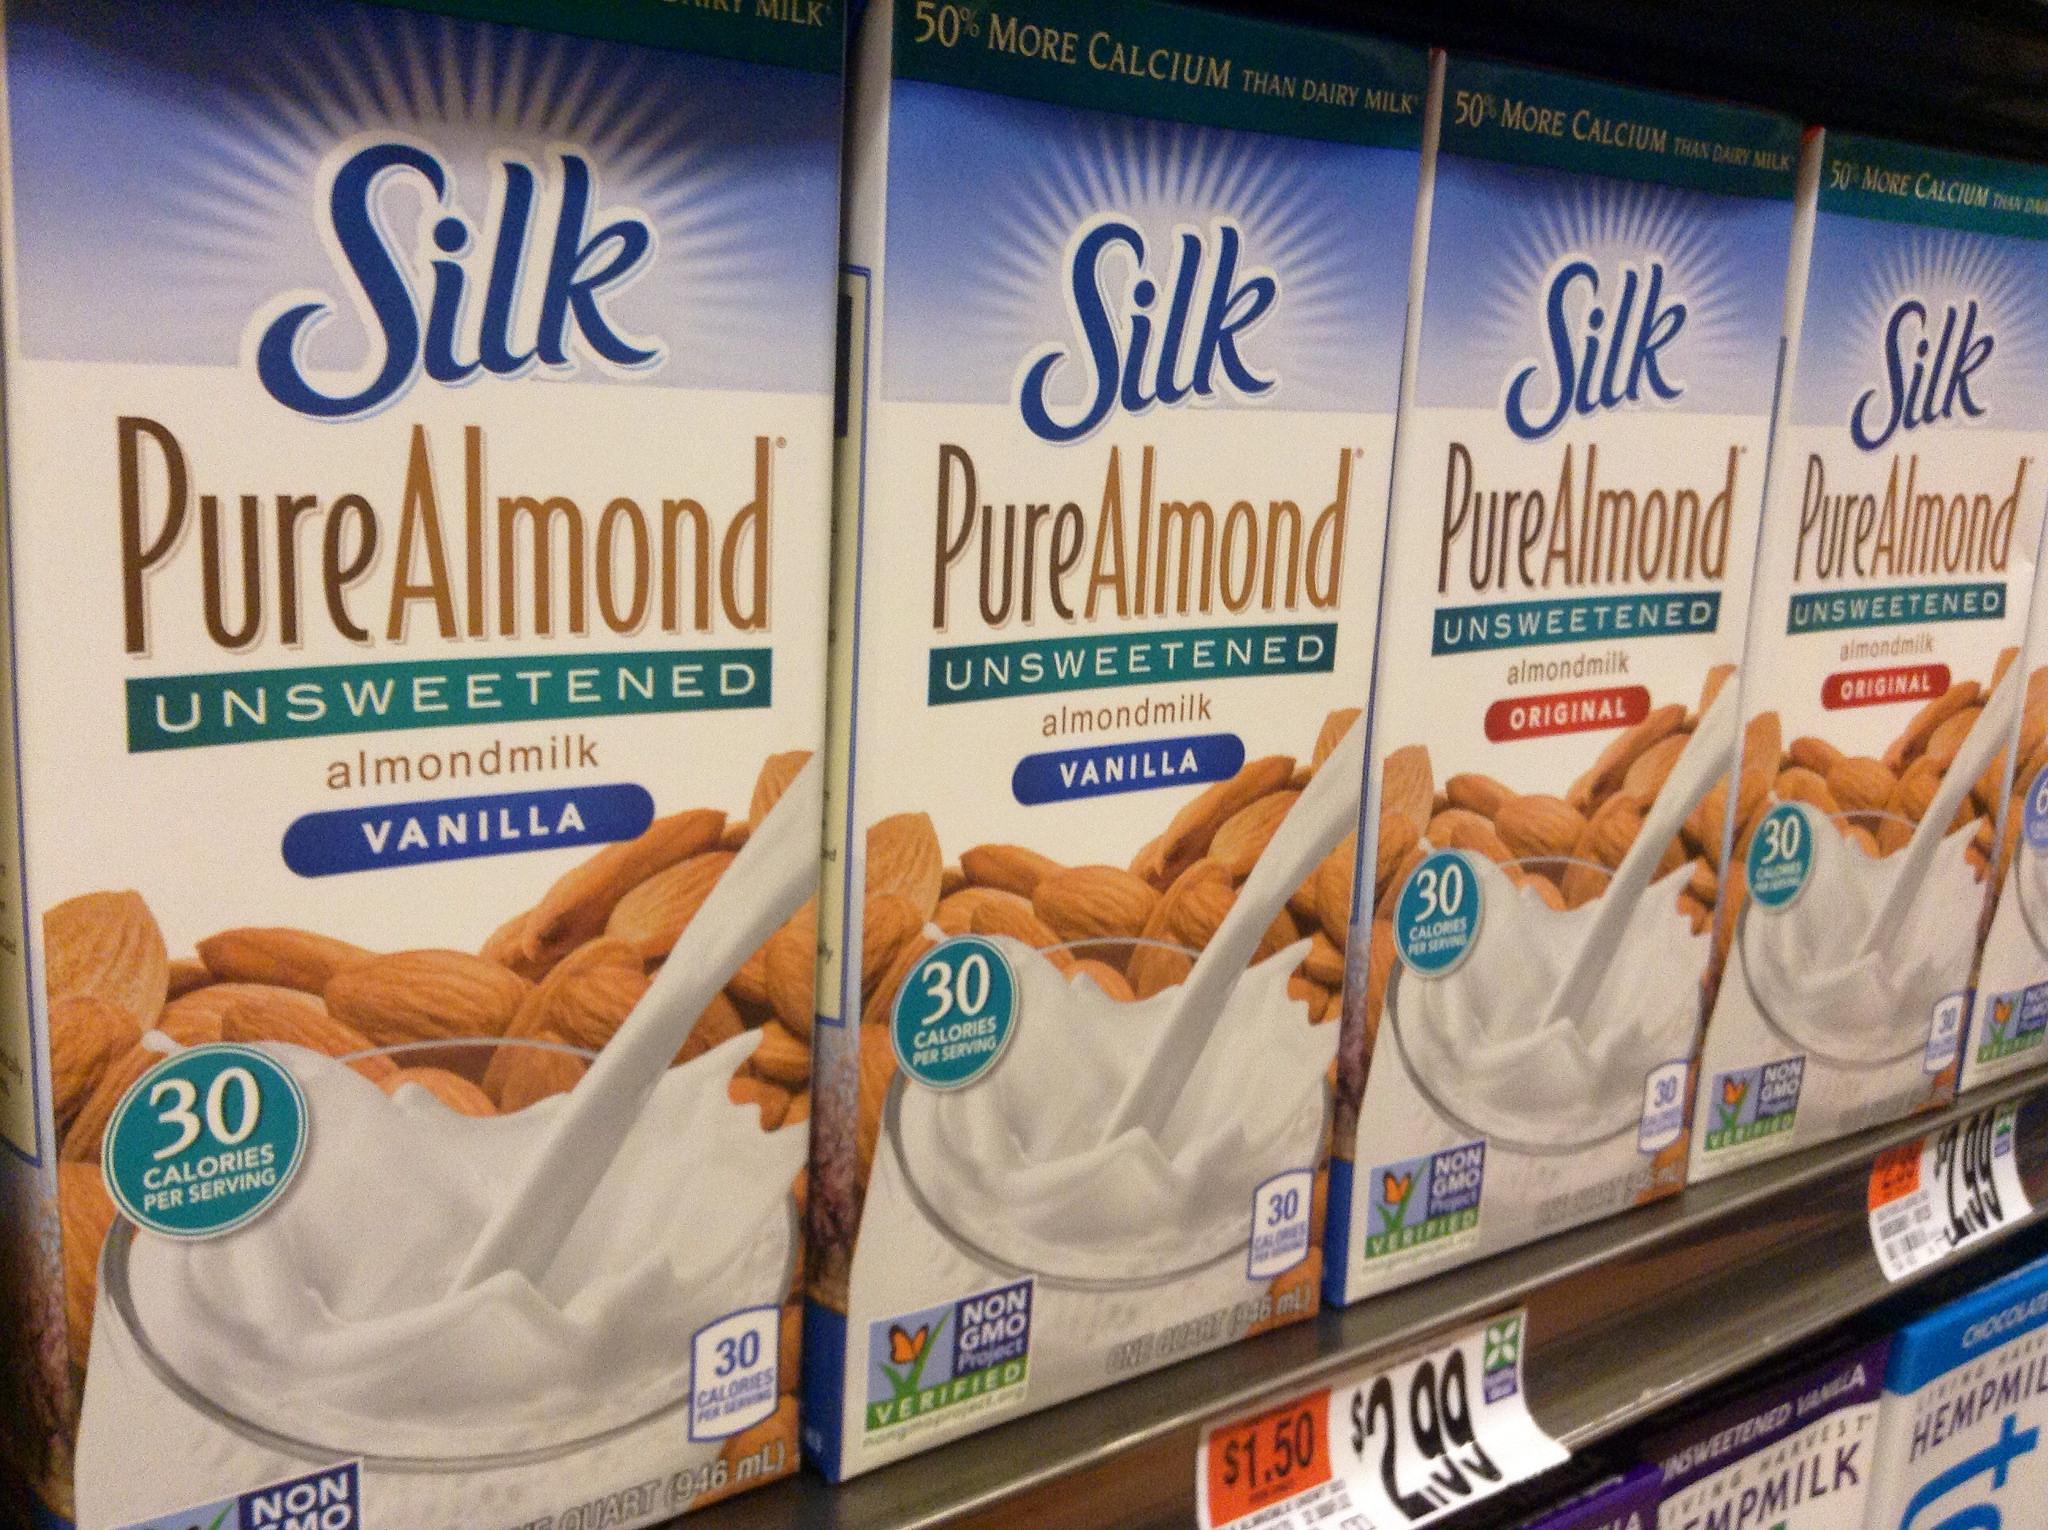 silkalmond